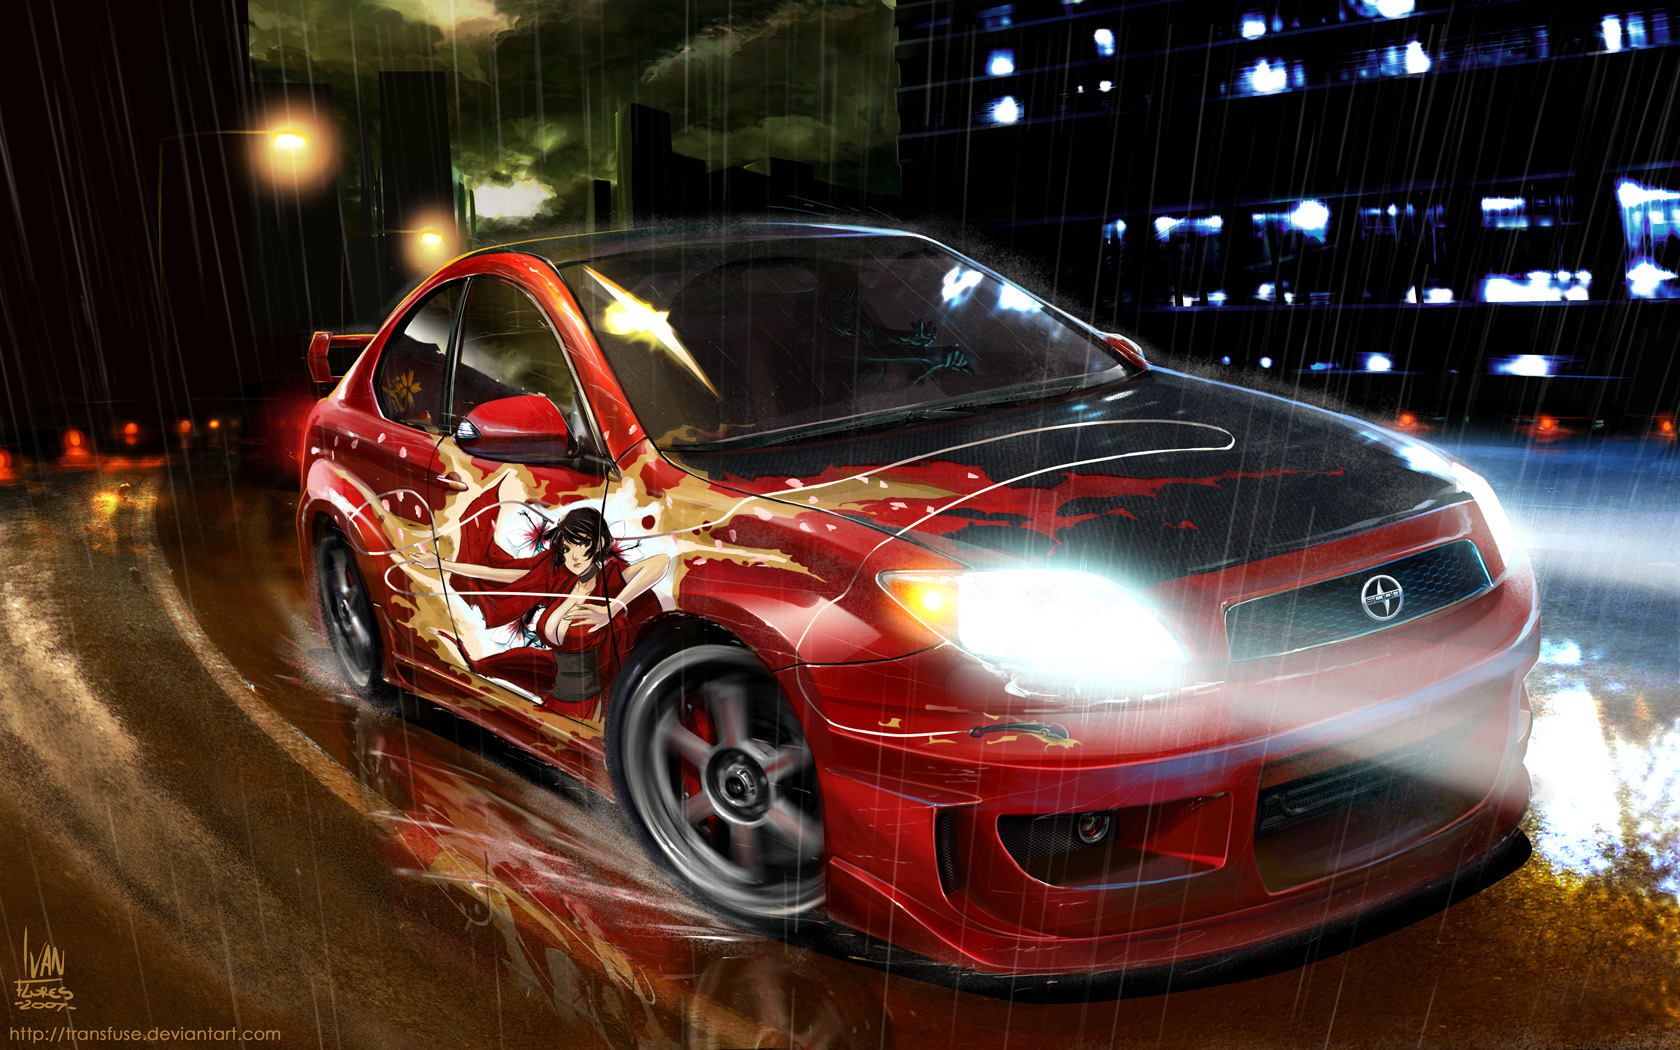 Tear It Up, Red Ninja by transfuse